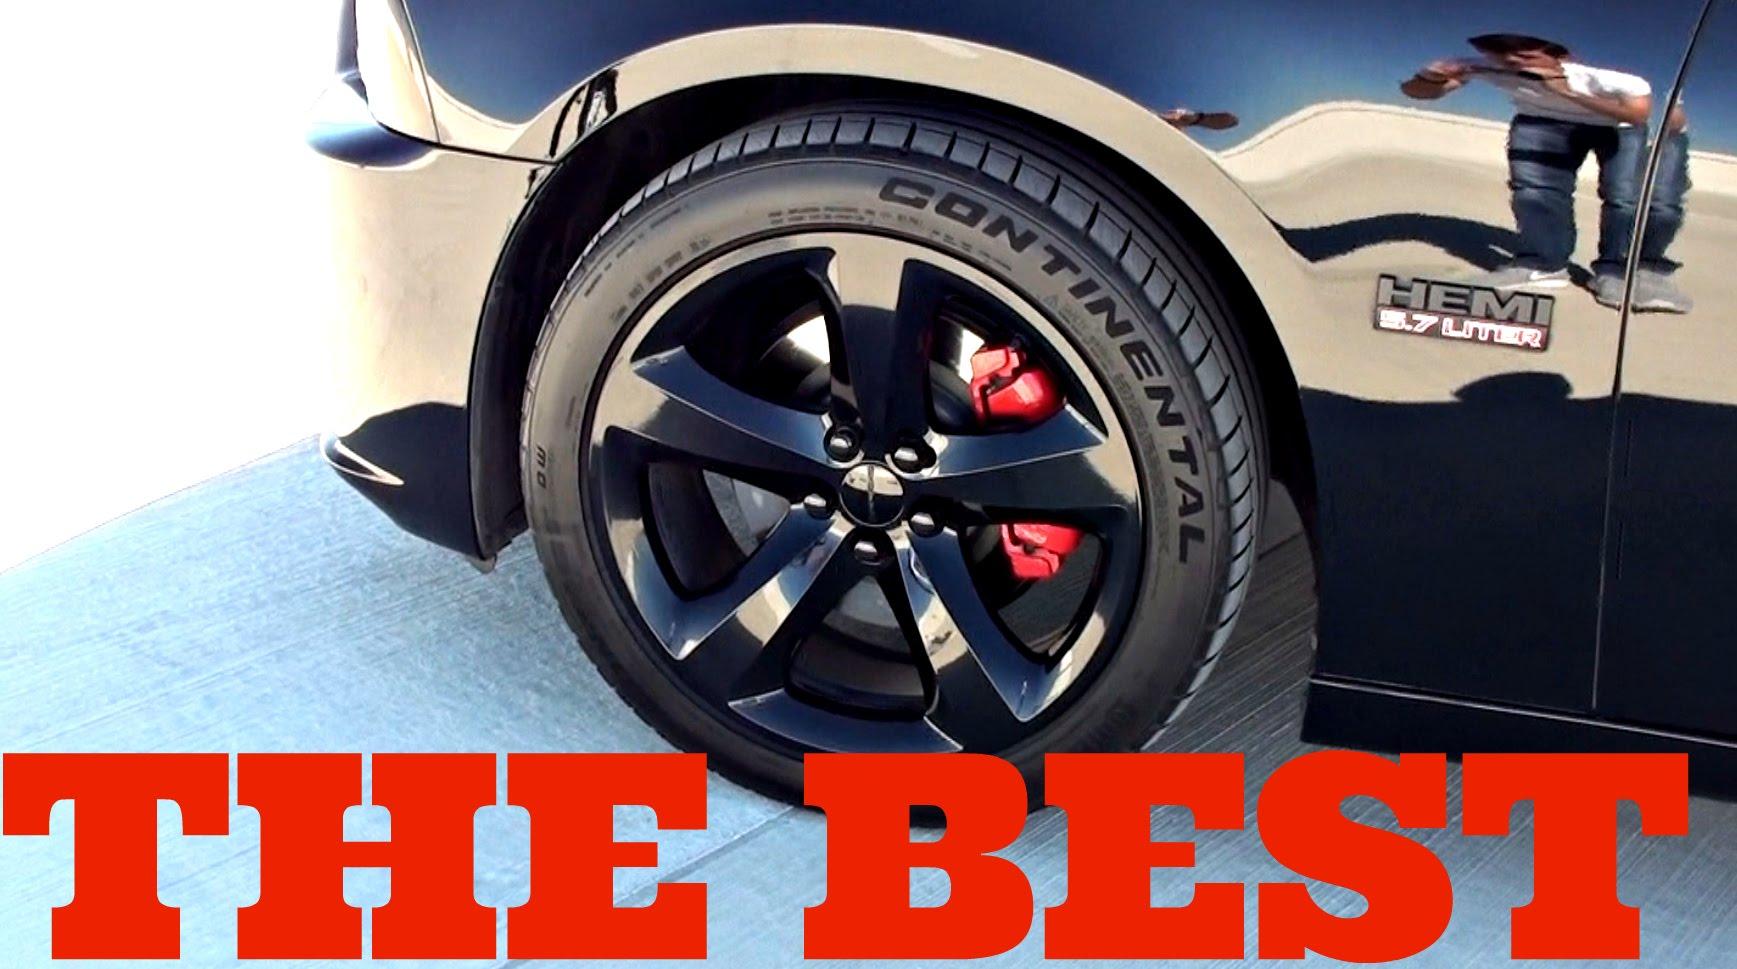 The Best/Longest Lasting Tire Shine Dressing - Adam's Polishes Super VRT